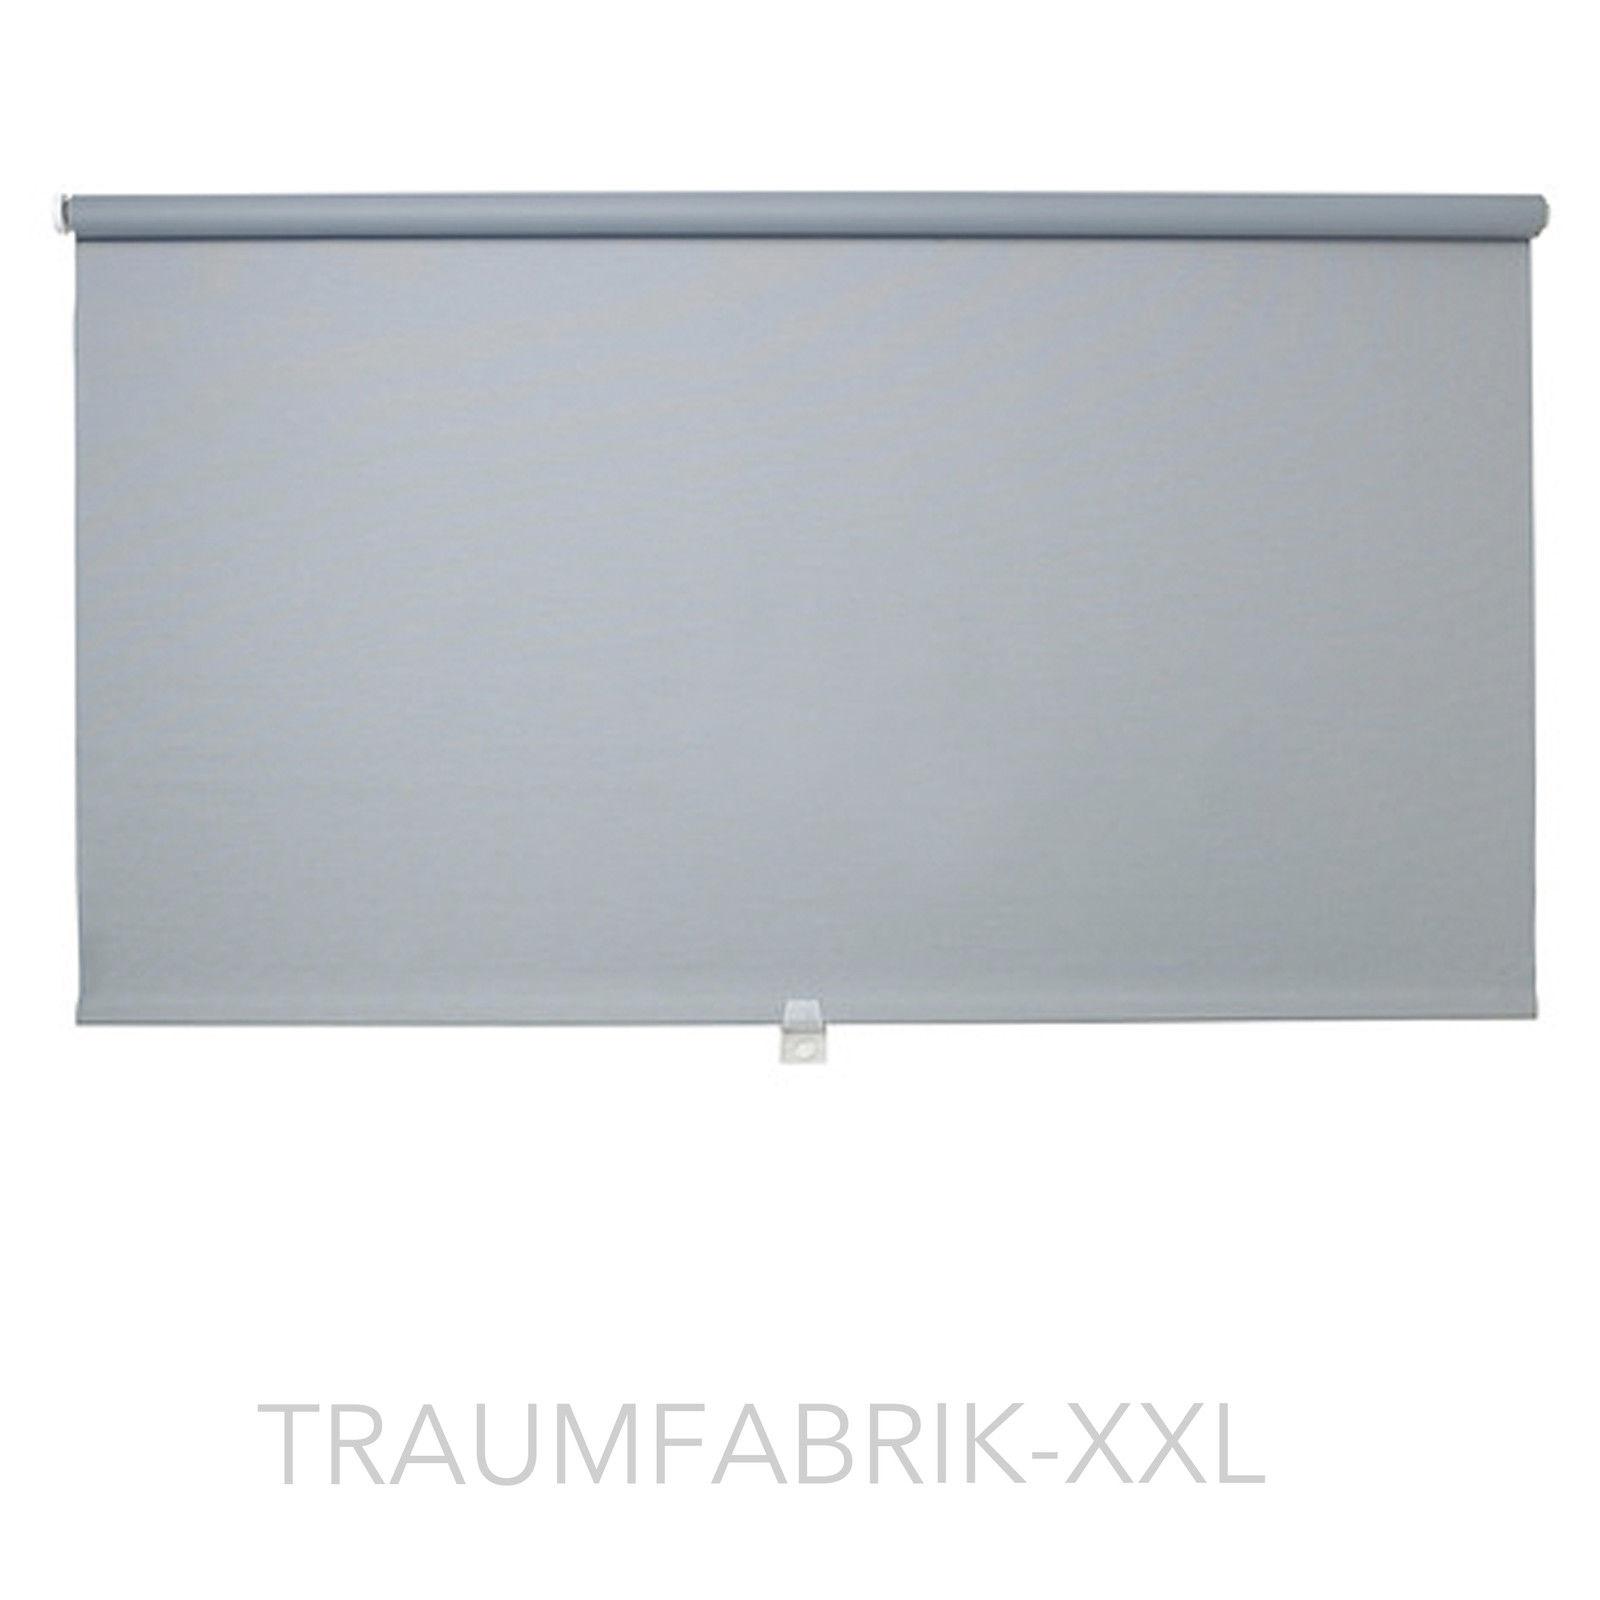 ikea tupplur verdunklungsrollo in grau 100 x 195 cm jalousie